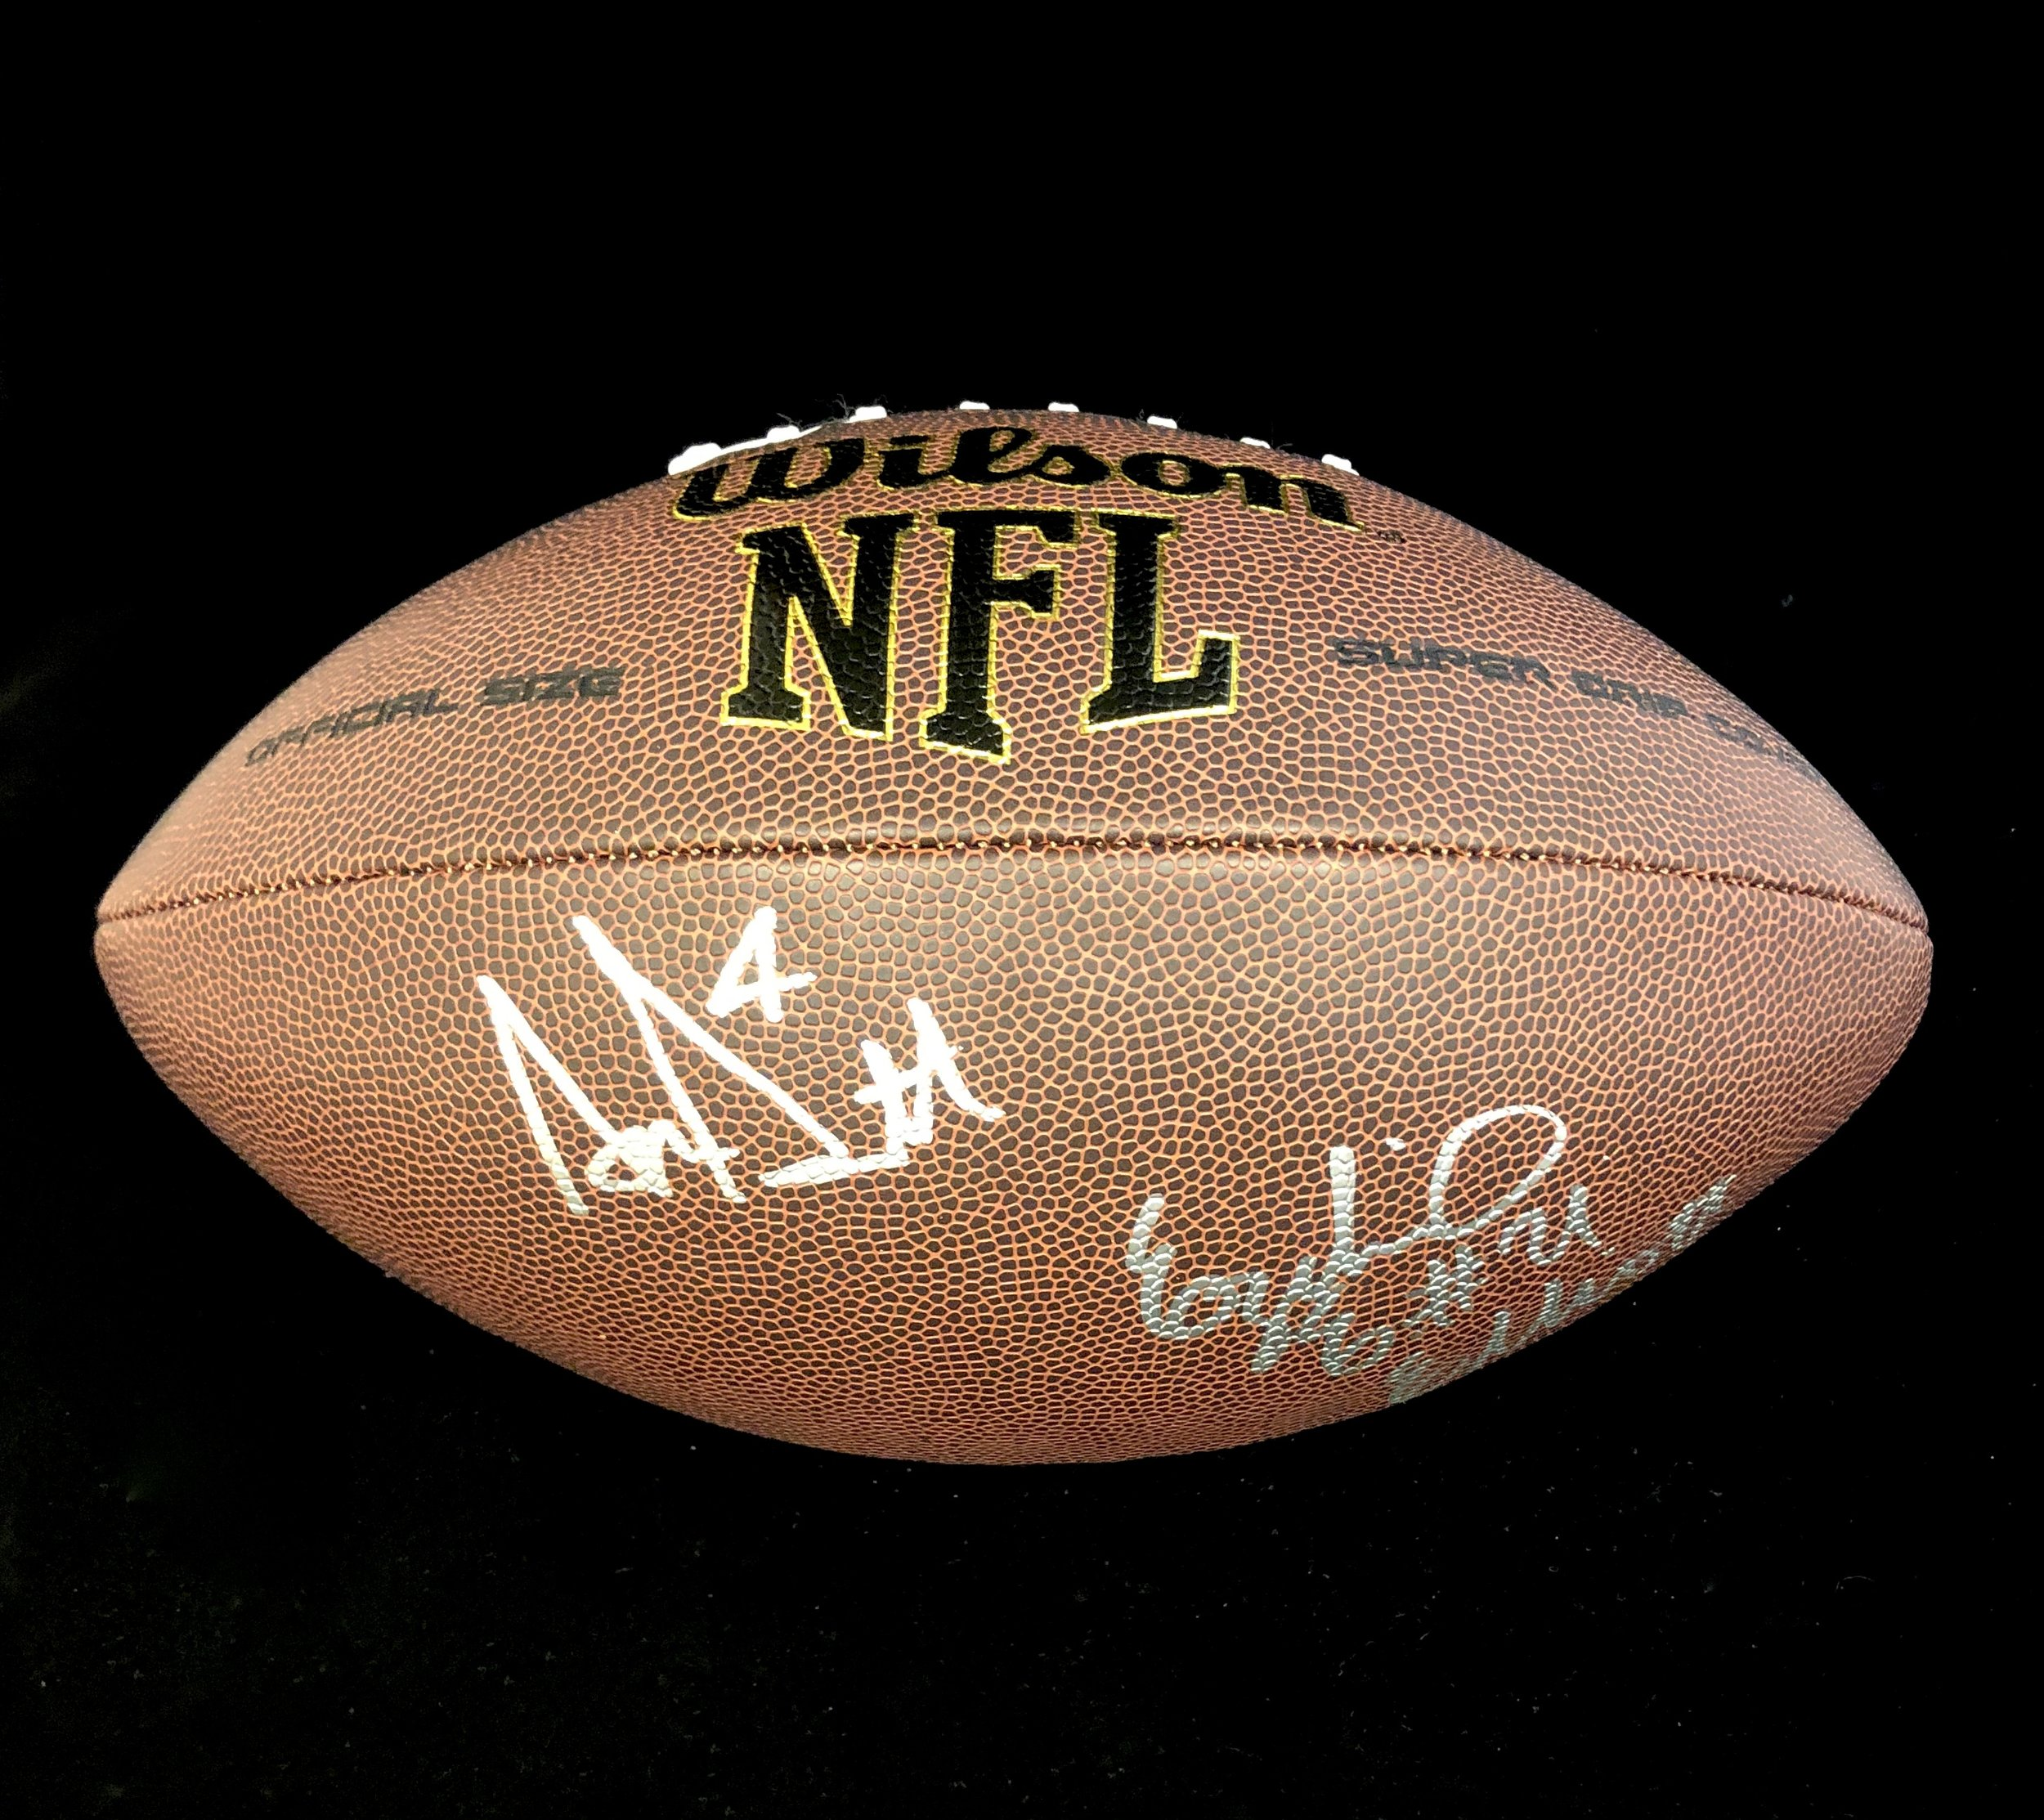 Dak Prescott & Ezekiel Elliott Autographed Football - Donor ~ Gateway Financial Solutions